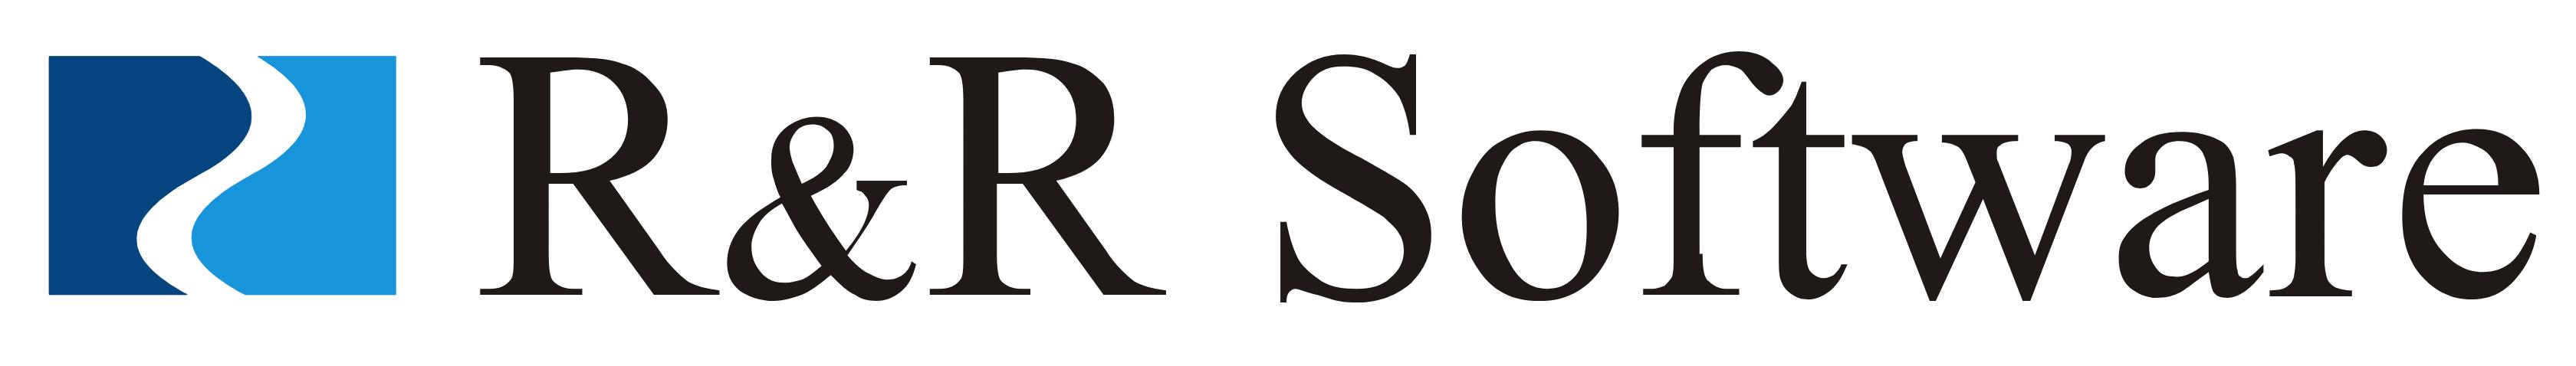 R&R Software